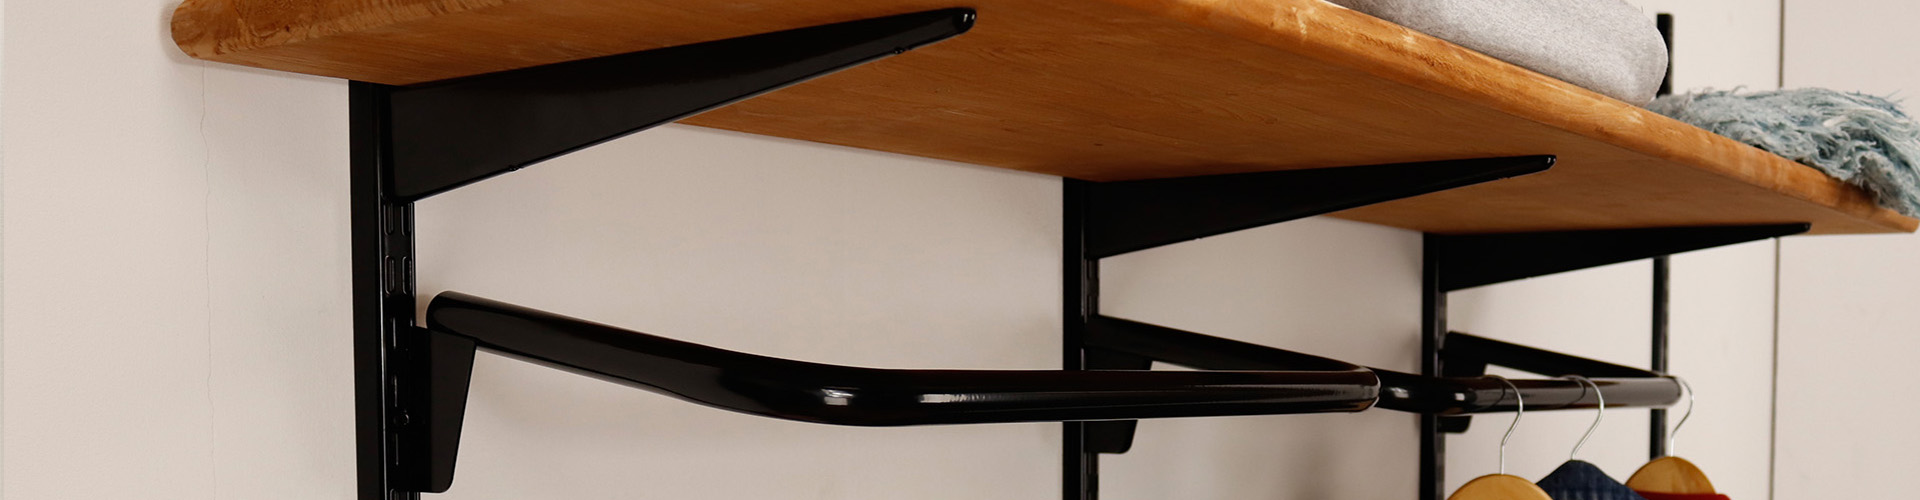 Sovella fipro wandrails met steigerhouten meubelen